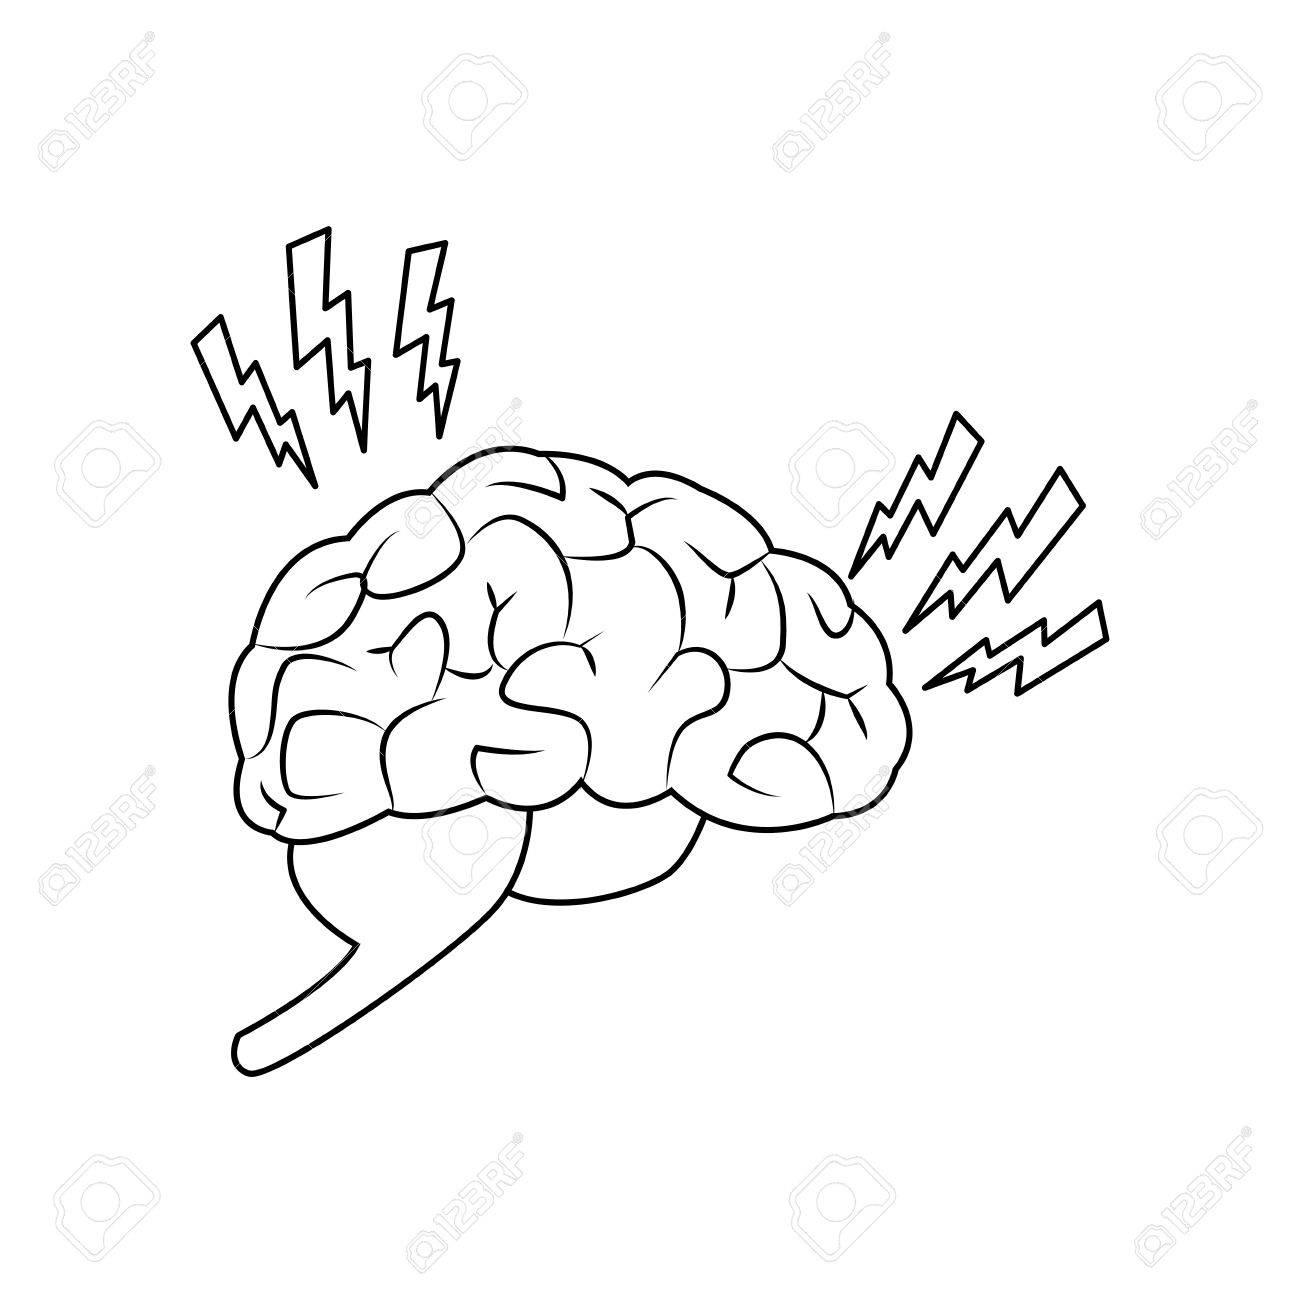 1300x1300 Abstract Human Brain Injury Stroke Cartoon Vector Illustration